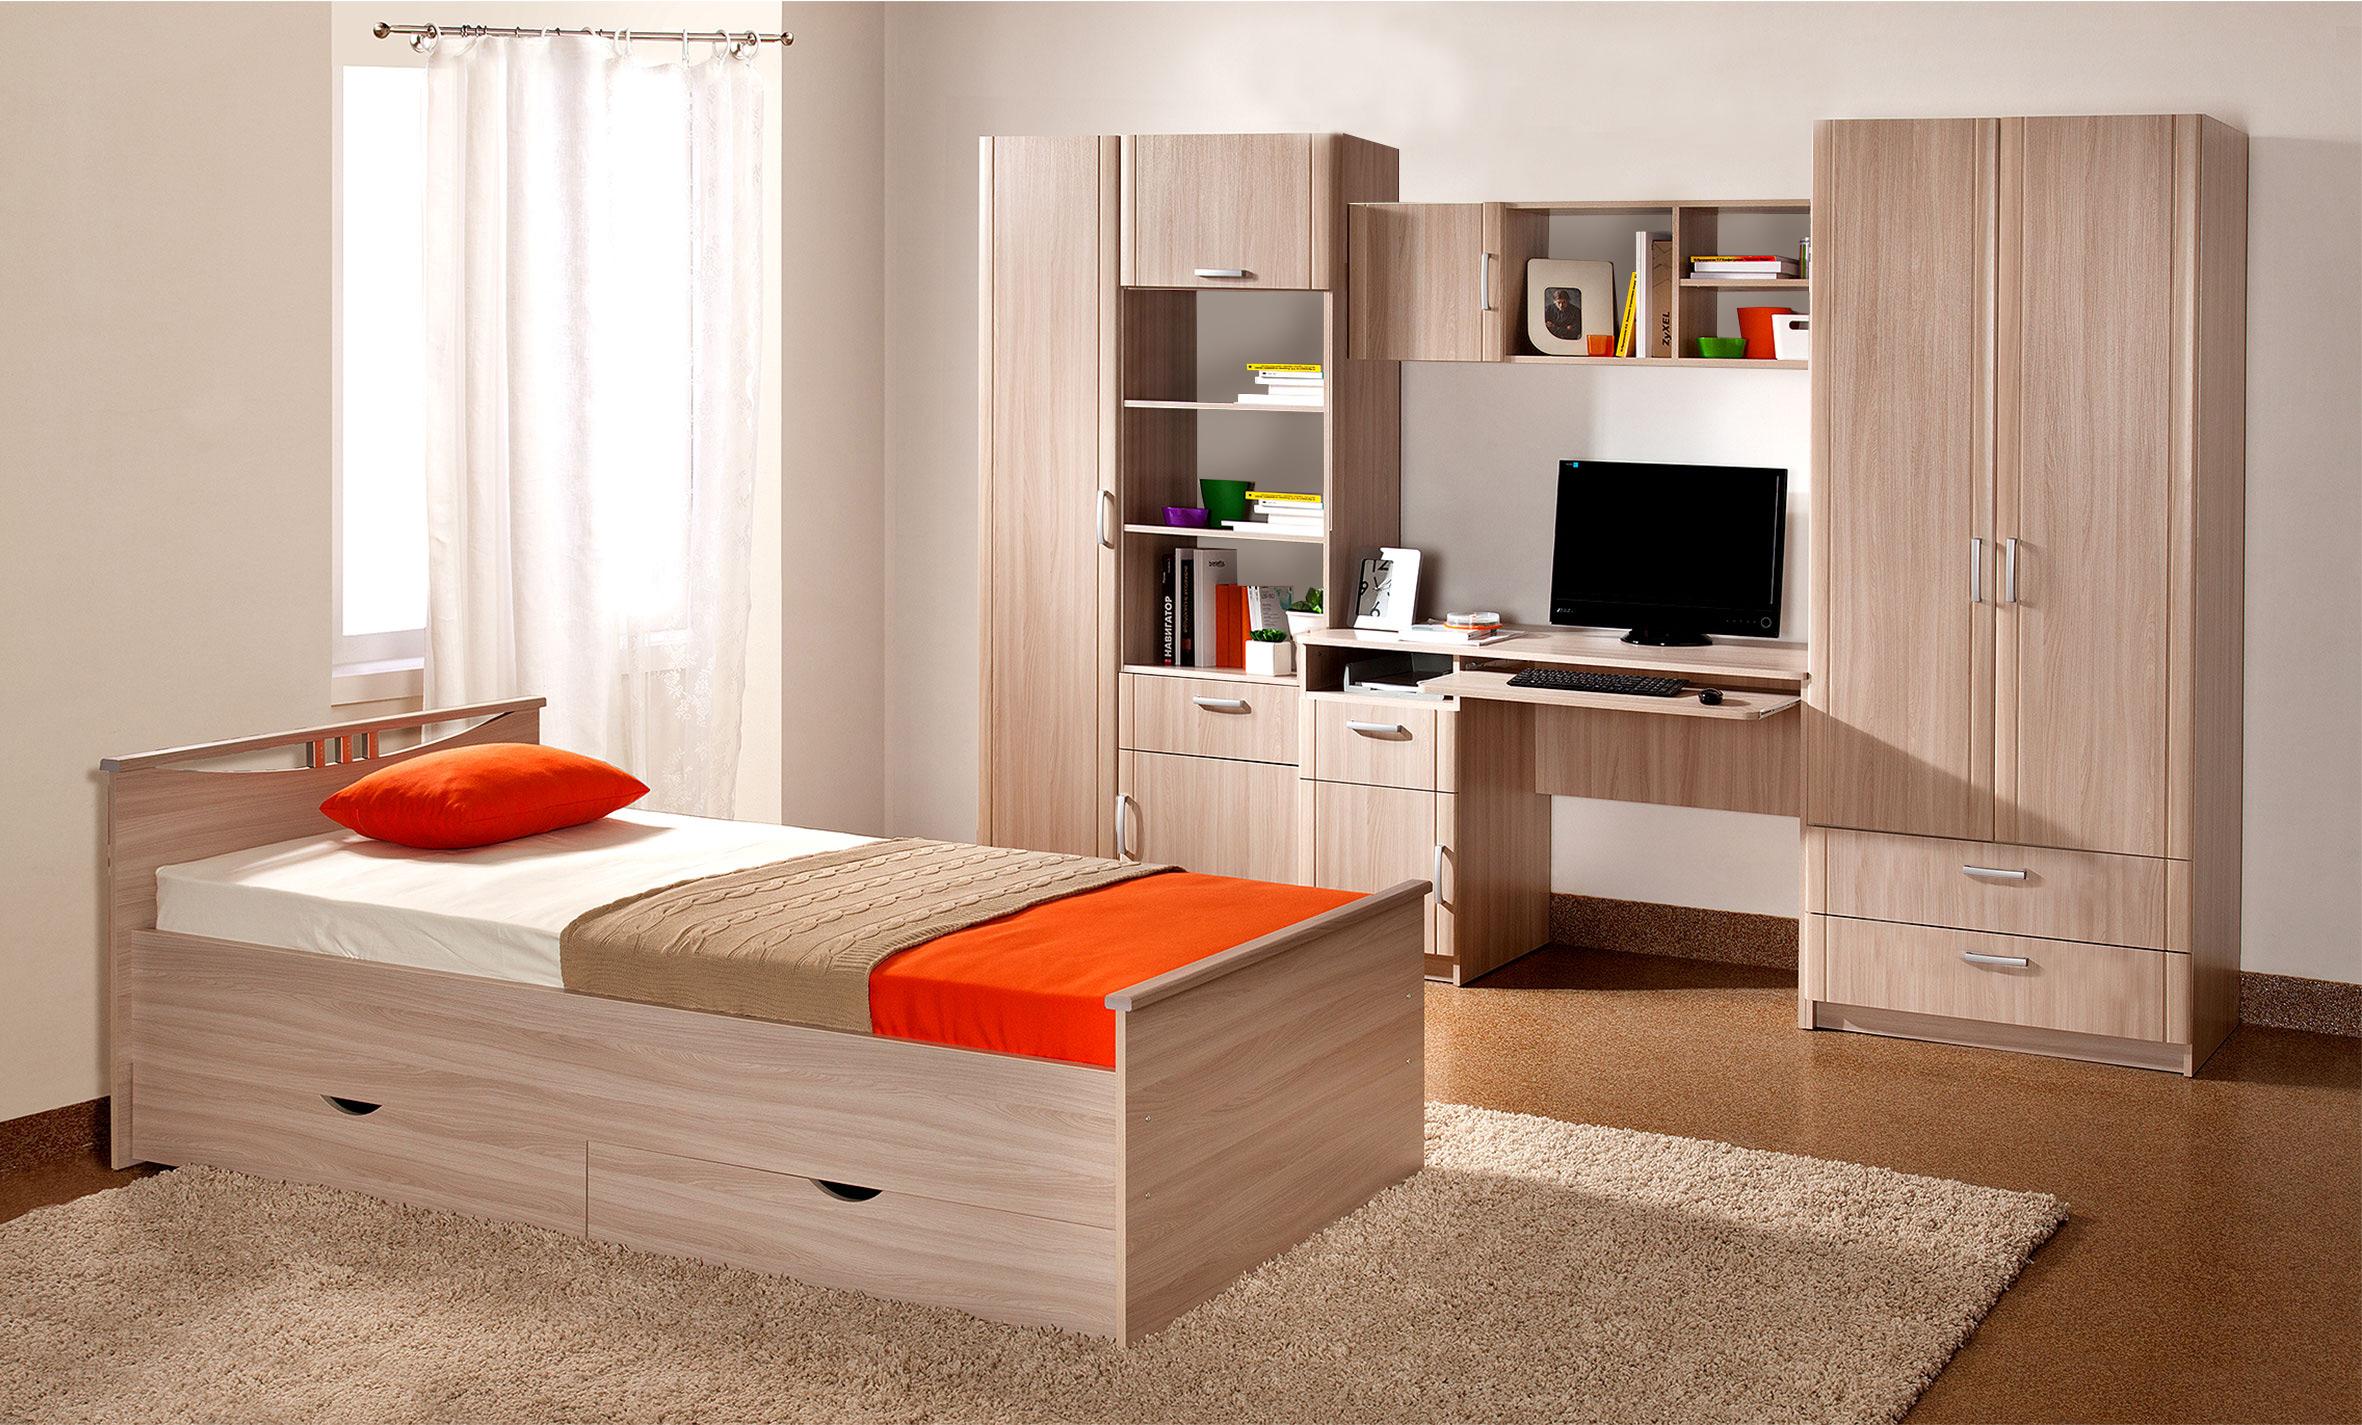 Детская комната Лотос-6 advesta детская комната advesta la man 6 предметов